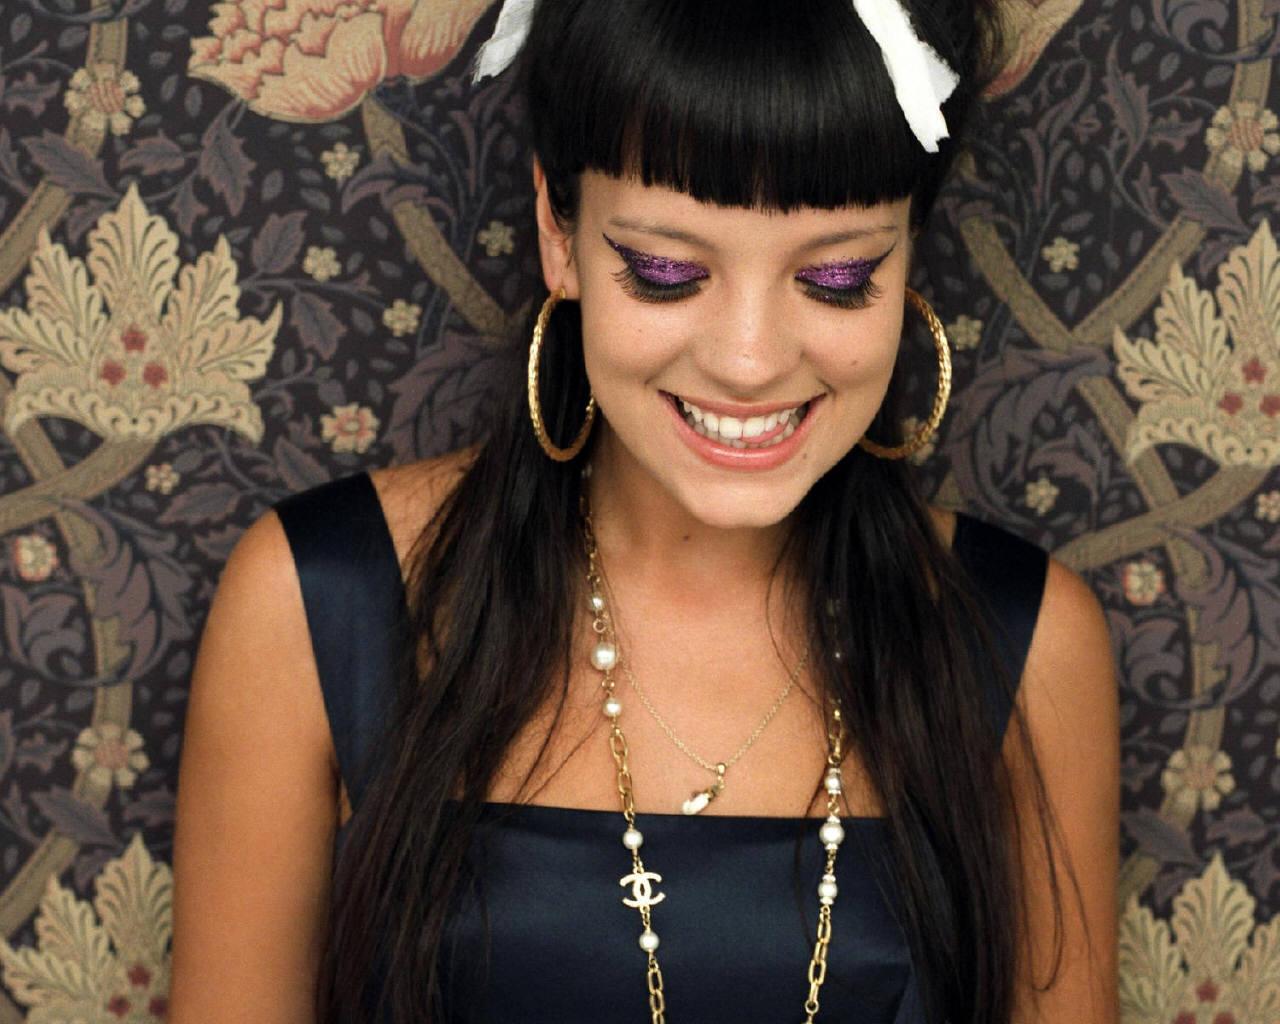 http://2.bp.blogspot.com/-RrVMd6AqUkg/T4JnbV60WII/AAAAAAAADrw/7XHA1MMaYmQ/s1600/Lily-Allen-lily-allen-154986_1280_1024.jpg